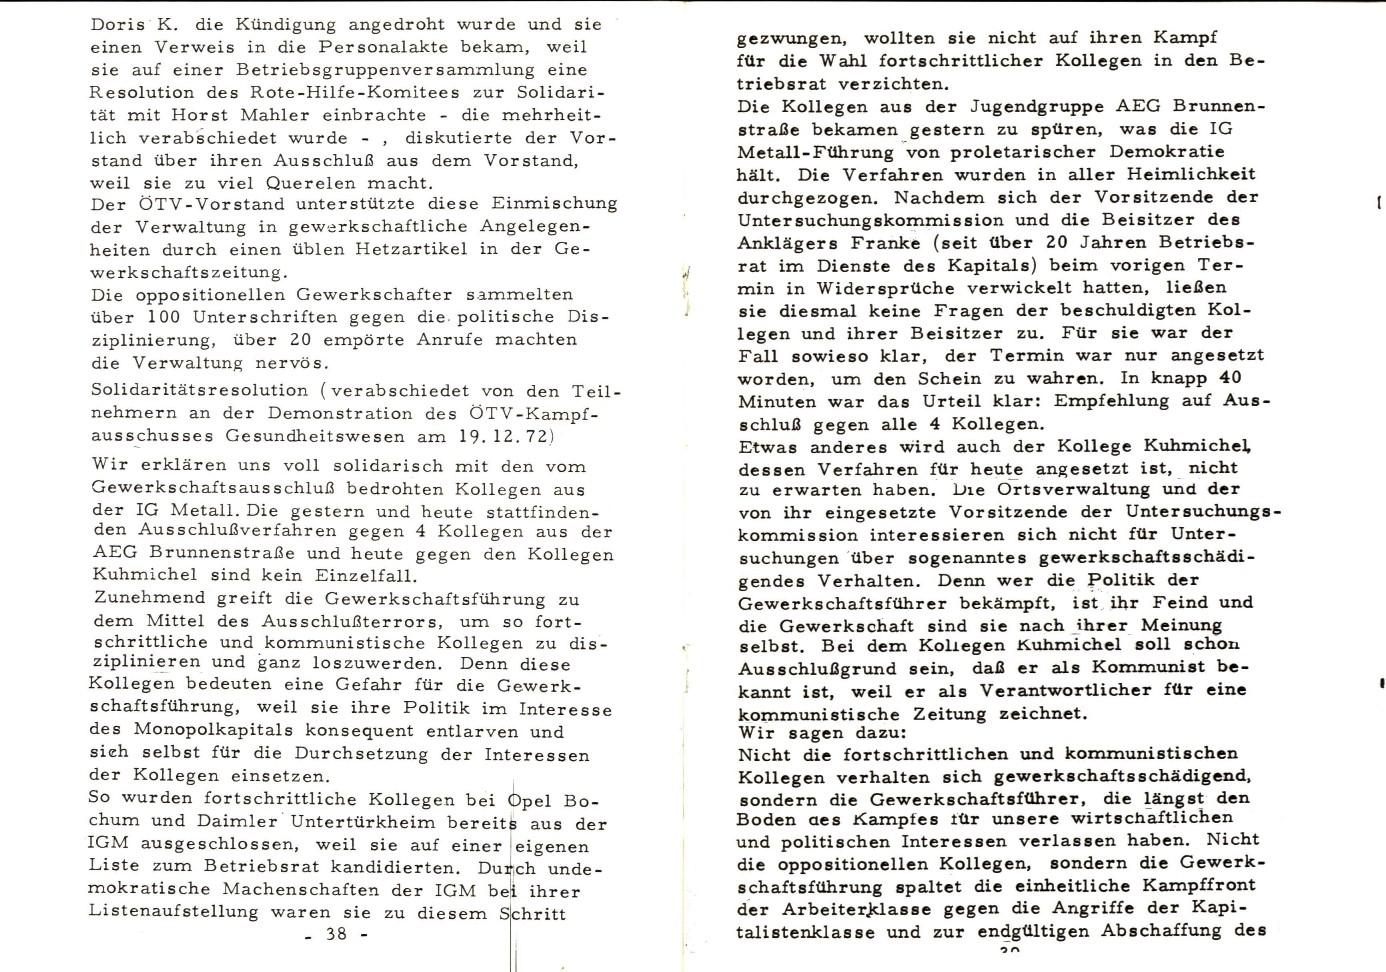 KJV_1973_NK_Arbeiterjugend_21